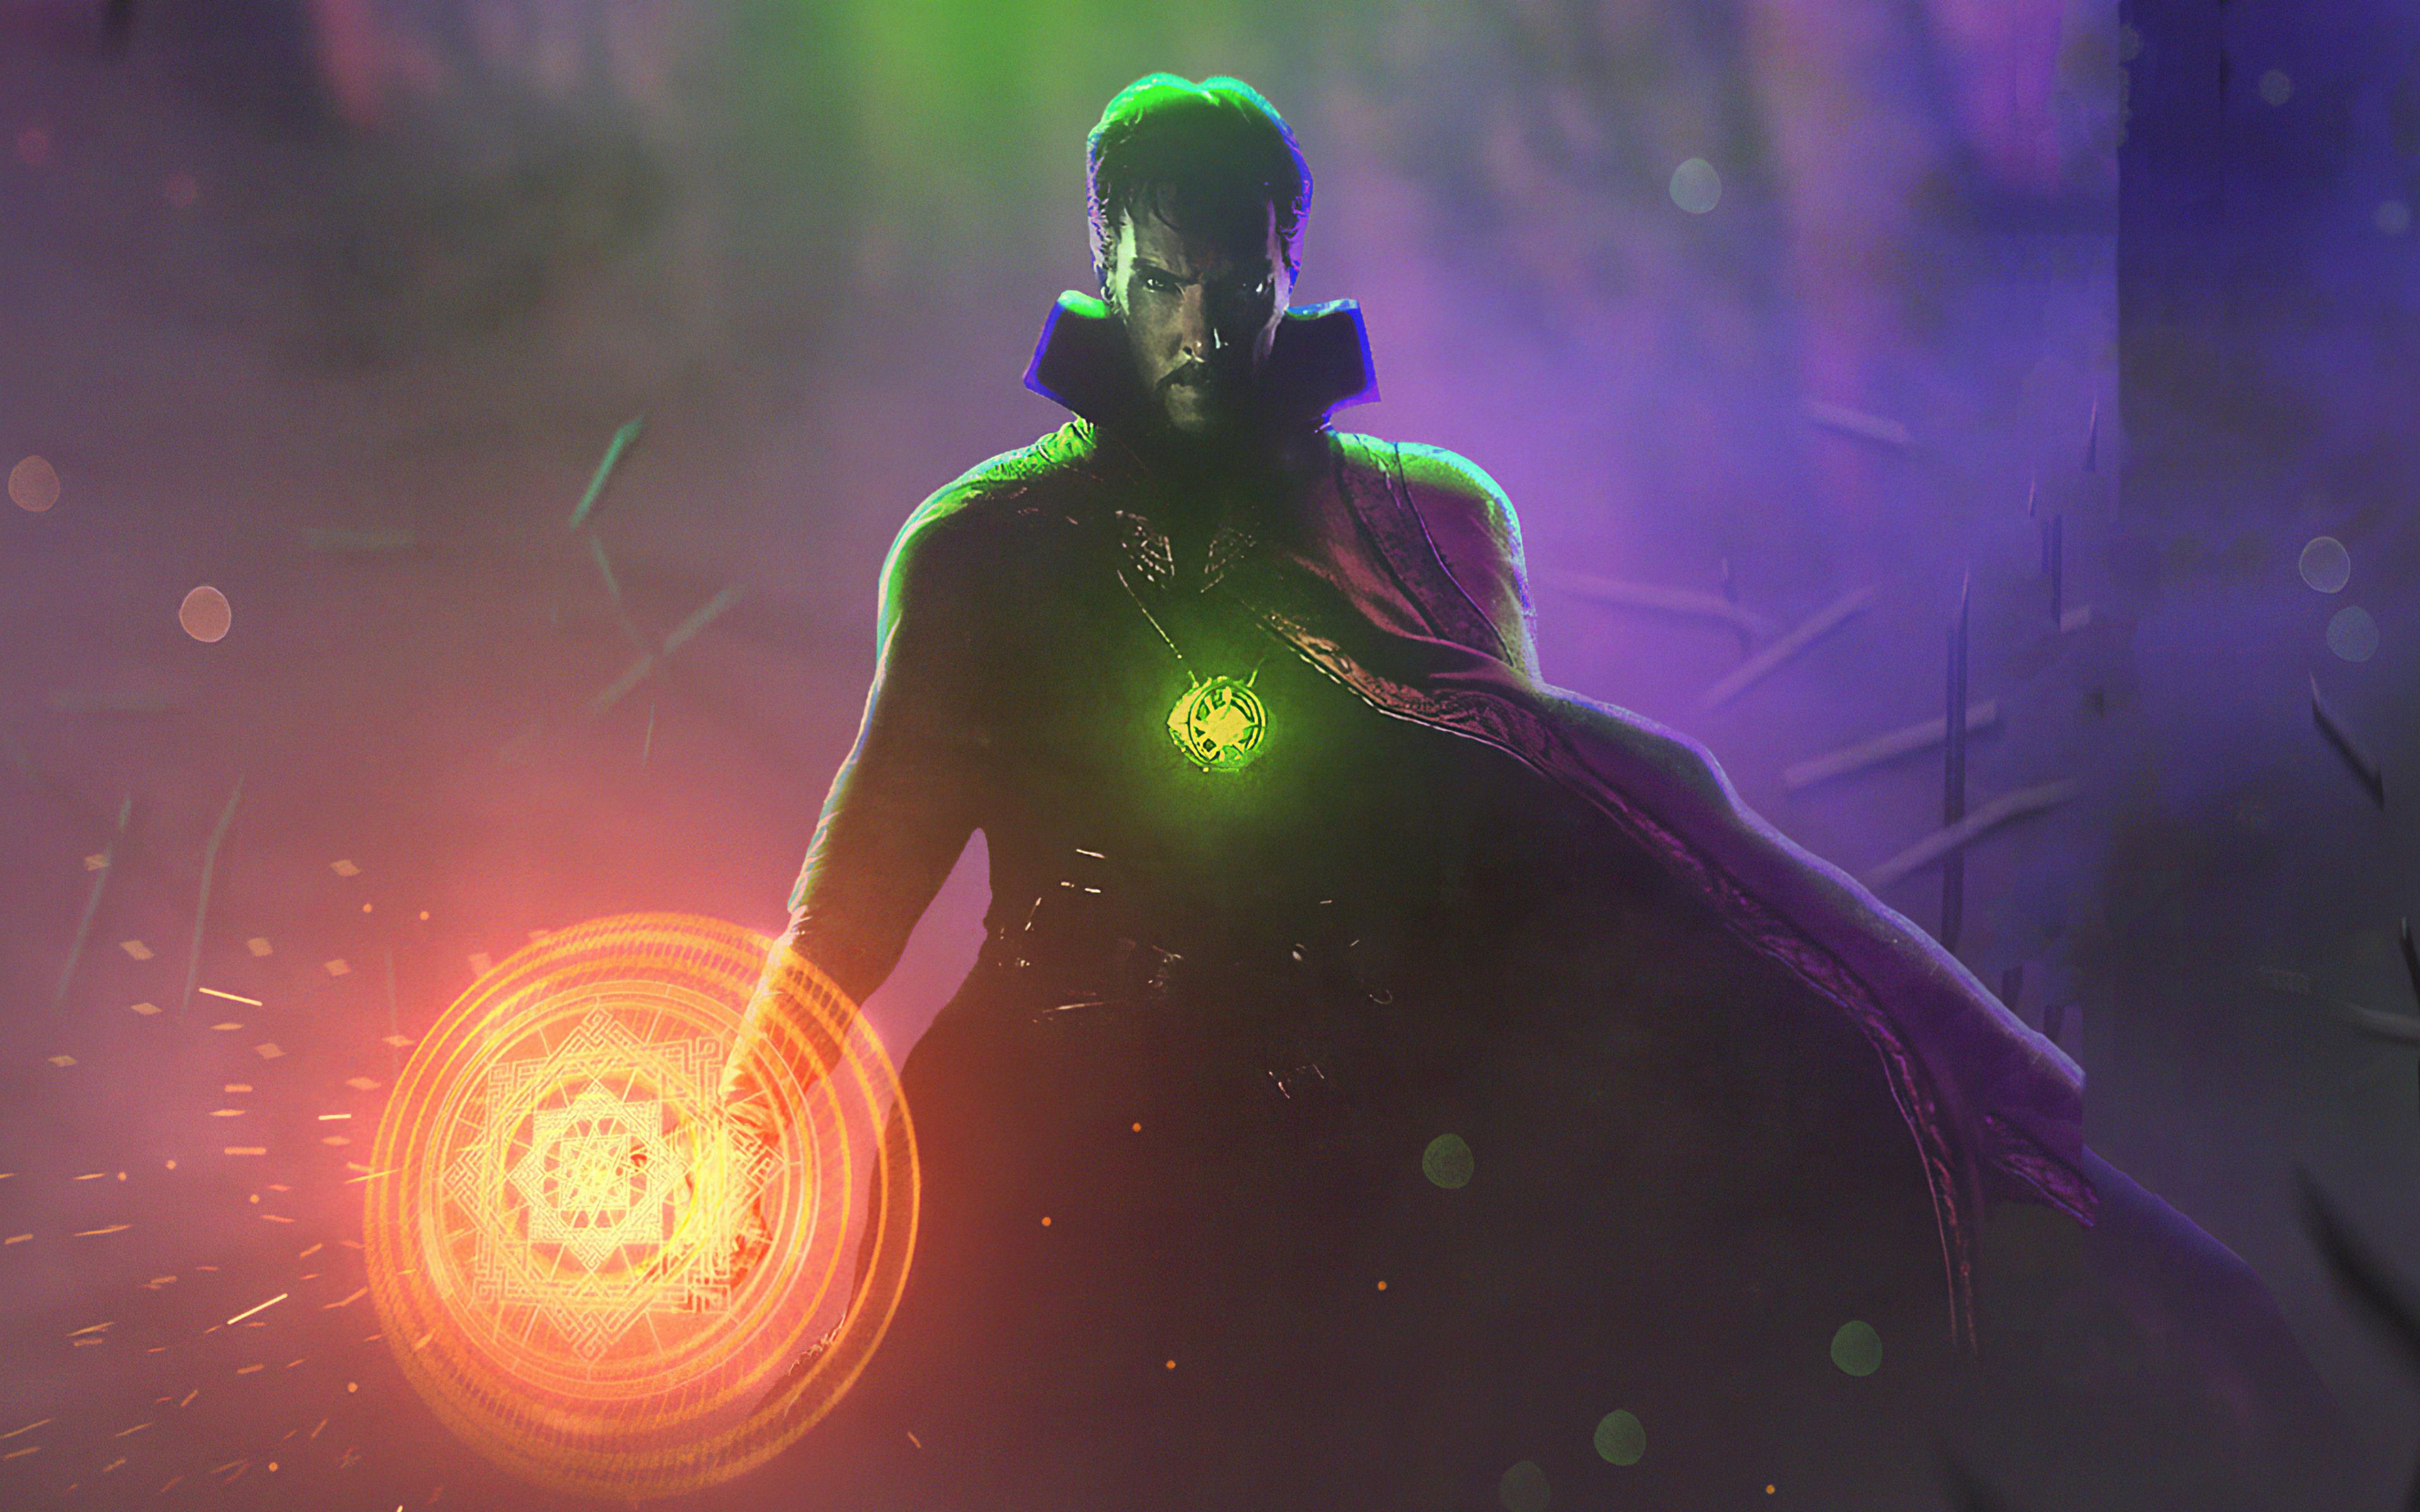 3840x2400 4k Doctor Strange Artwork 2020 4k HD 4k ...